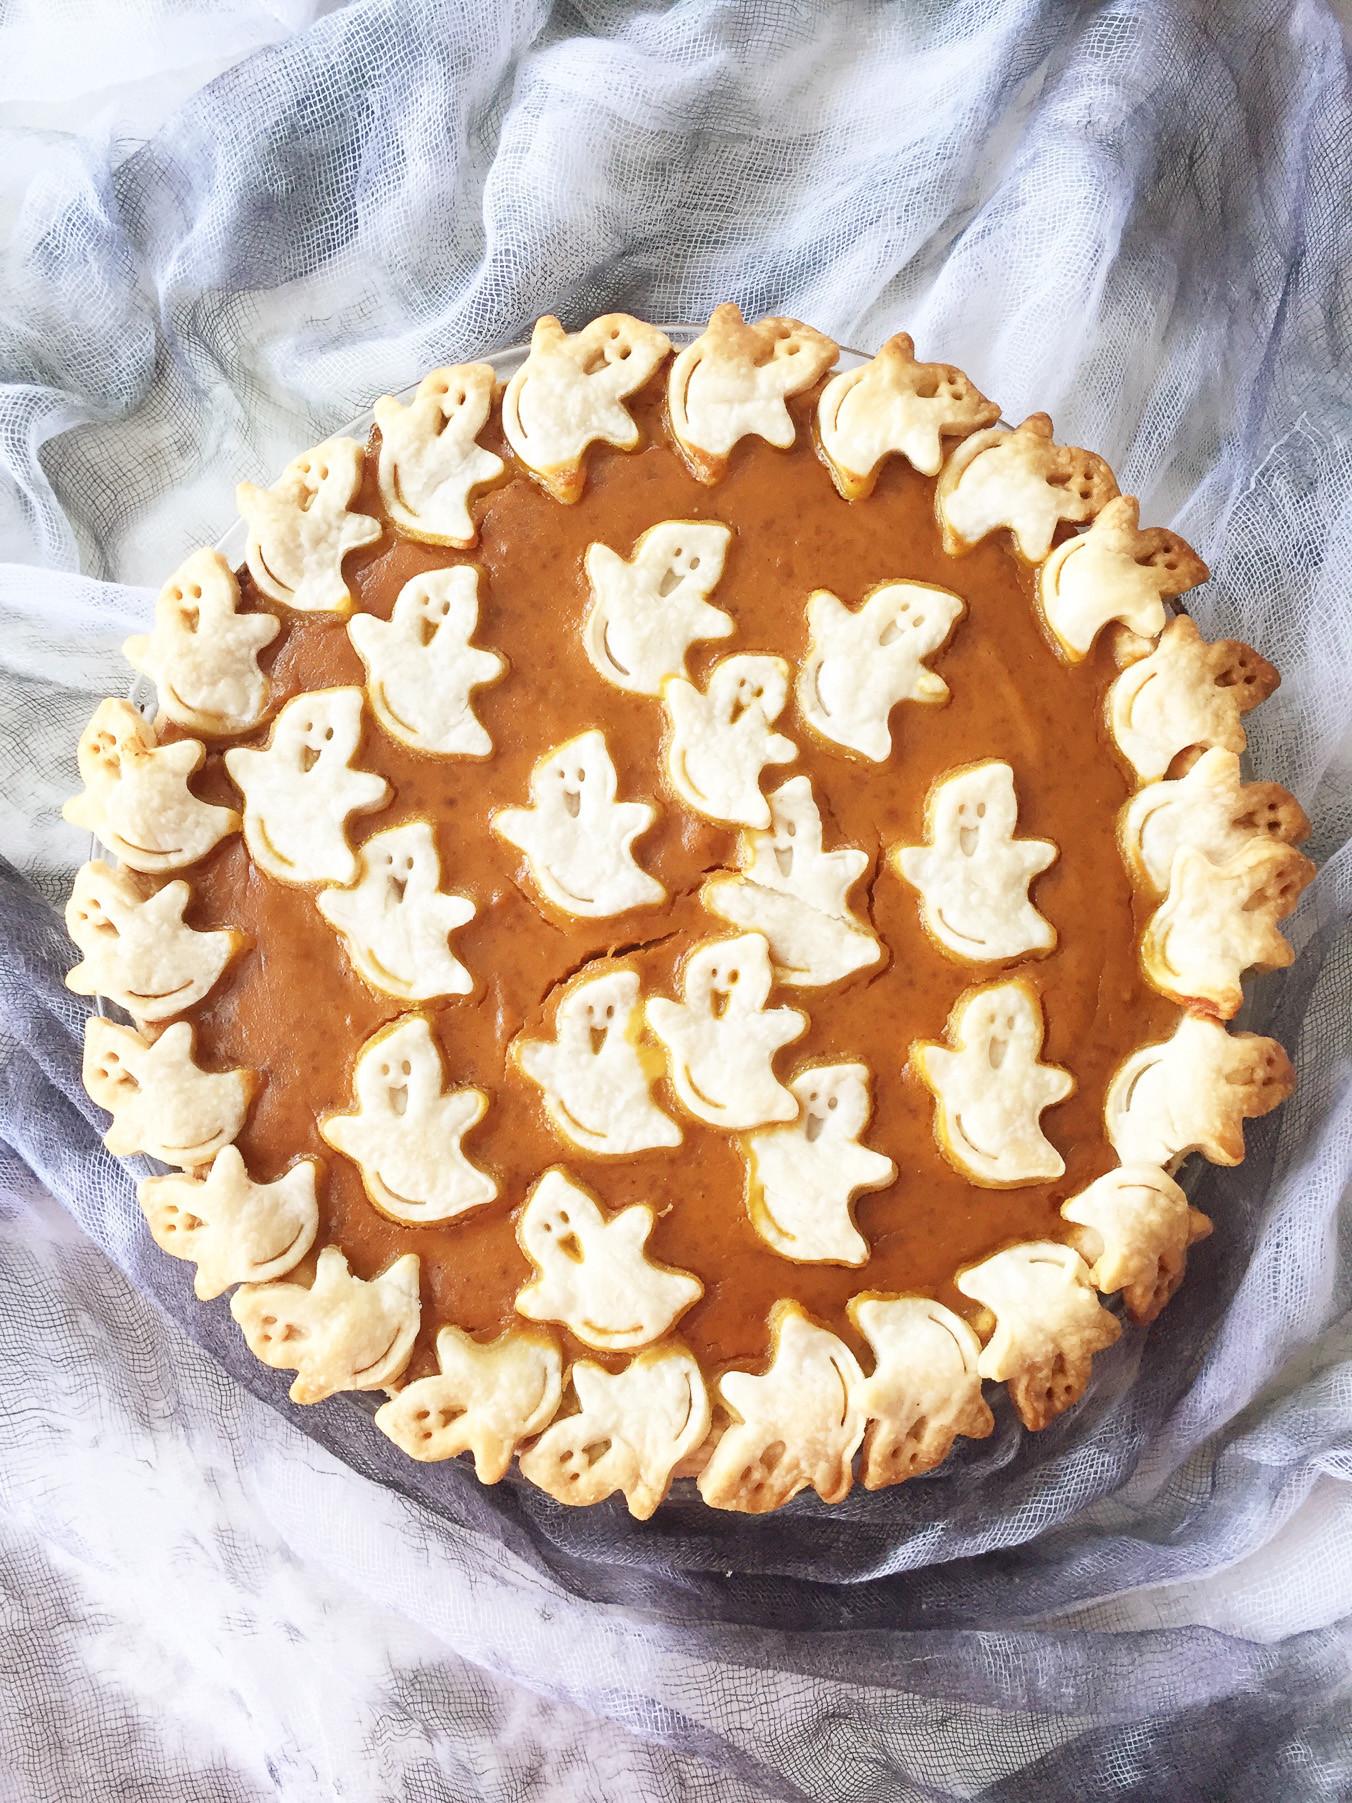 Halloween Pumpkin Pie  Halloween Pumpkin Pie A Pretty Life In The Suburbs